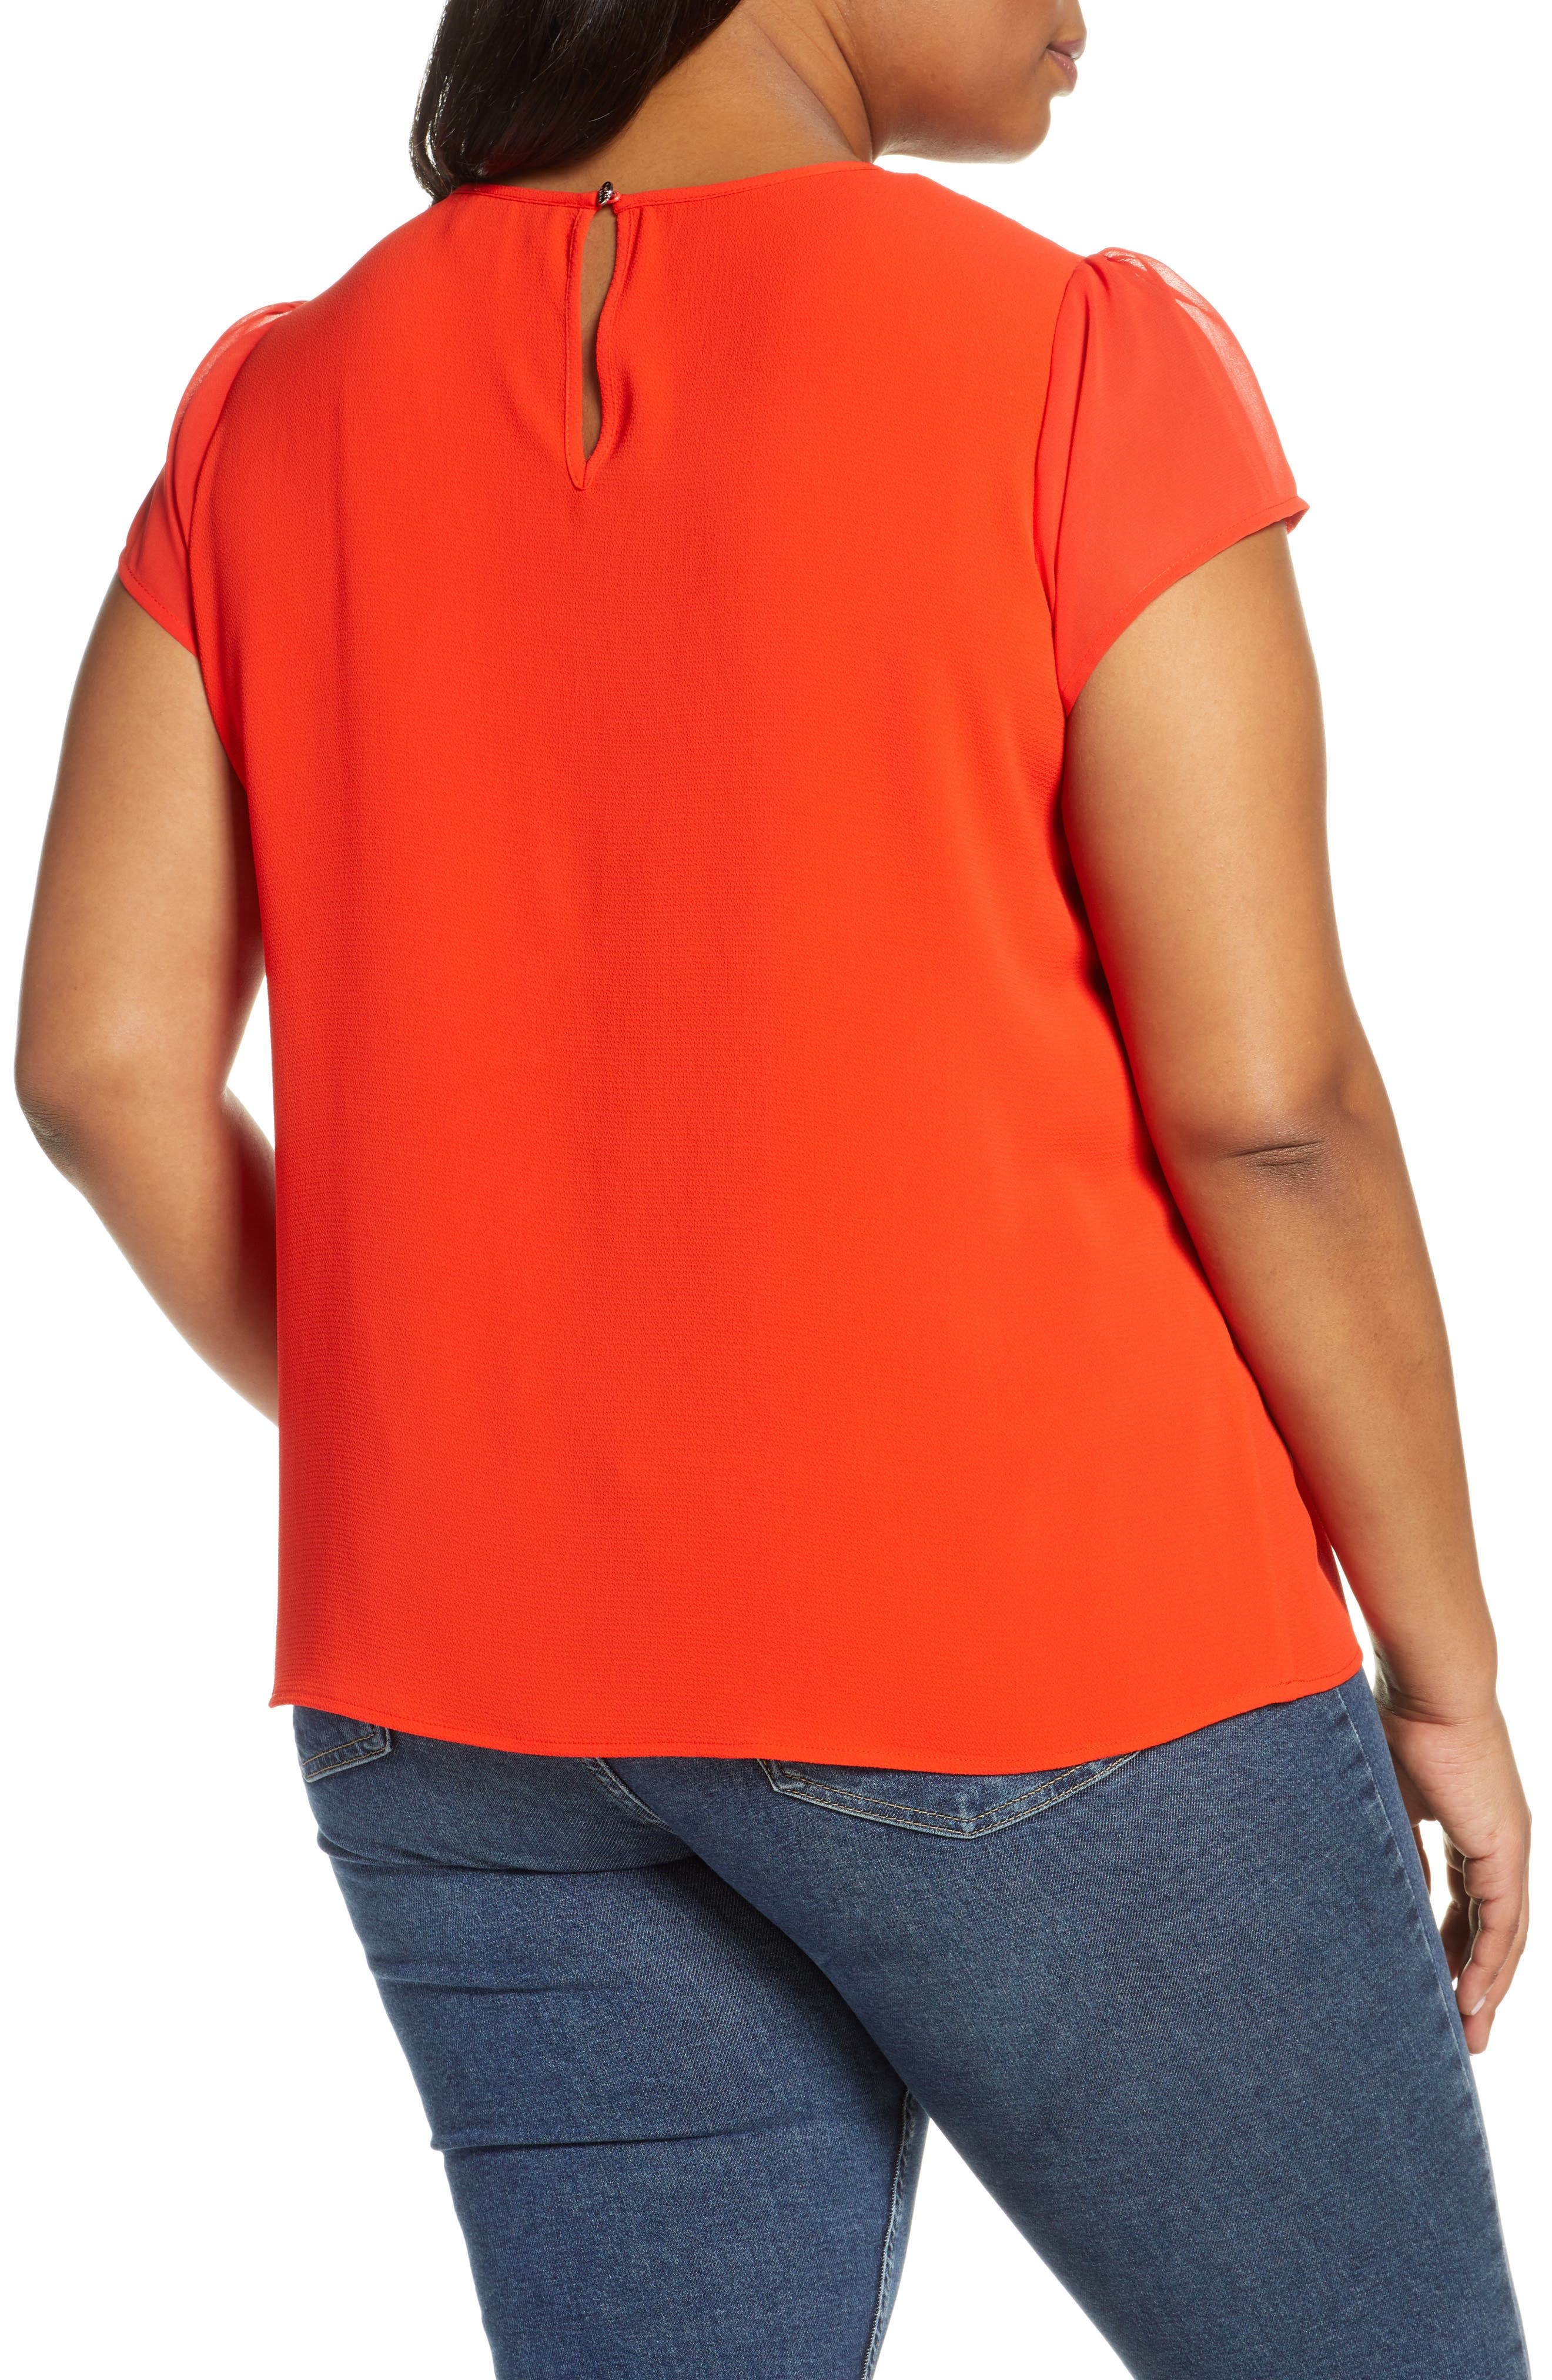 2ff1dc8e575 Women's Plus-Size Tops   Nordstrom